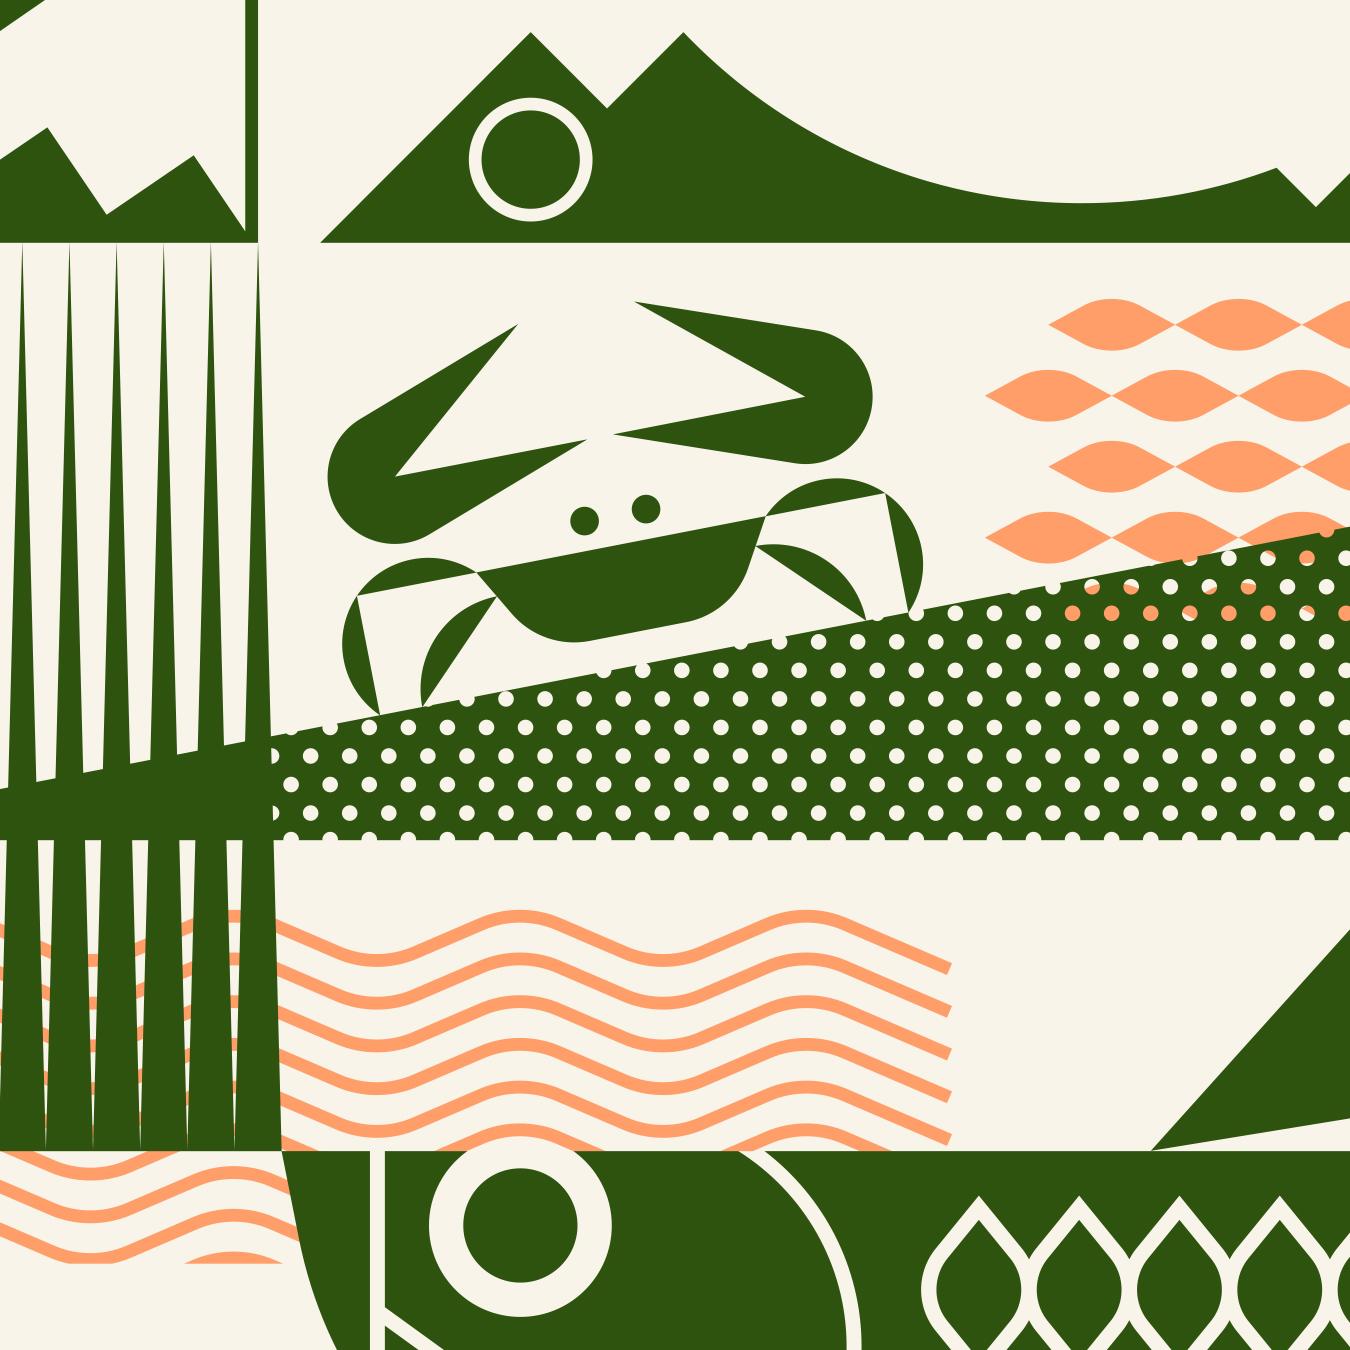 Everglades Alligator, Crab and Tarpon Illustration Detail